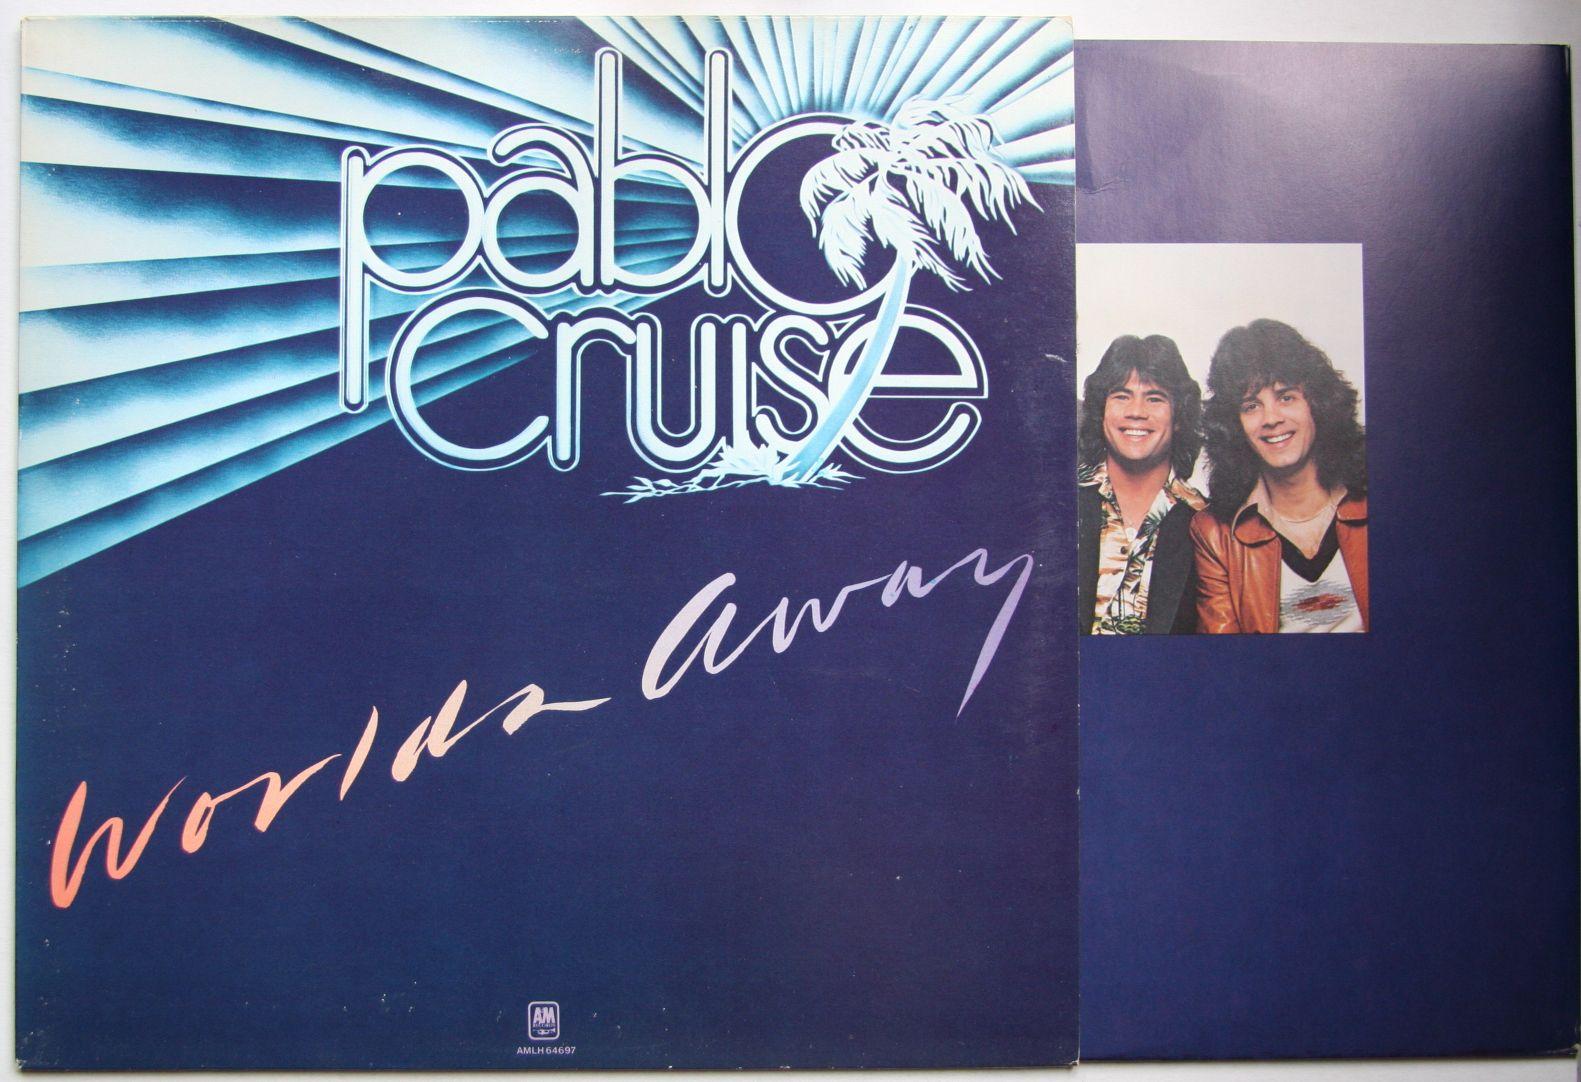 Pablo Cruise - Worlds Away Vinyl